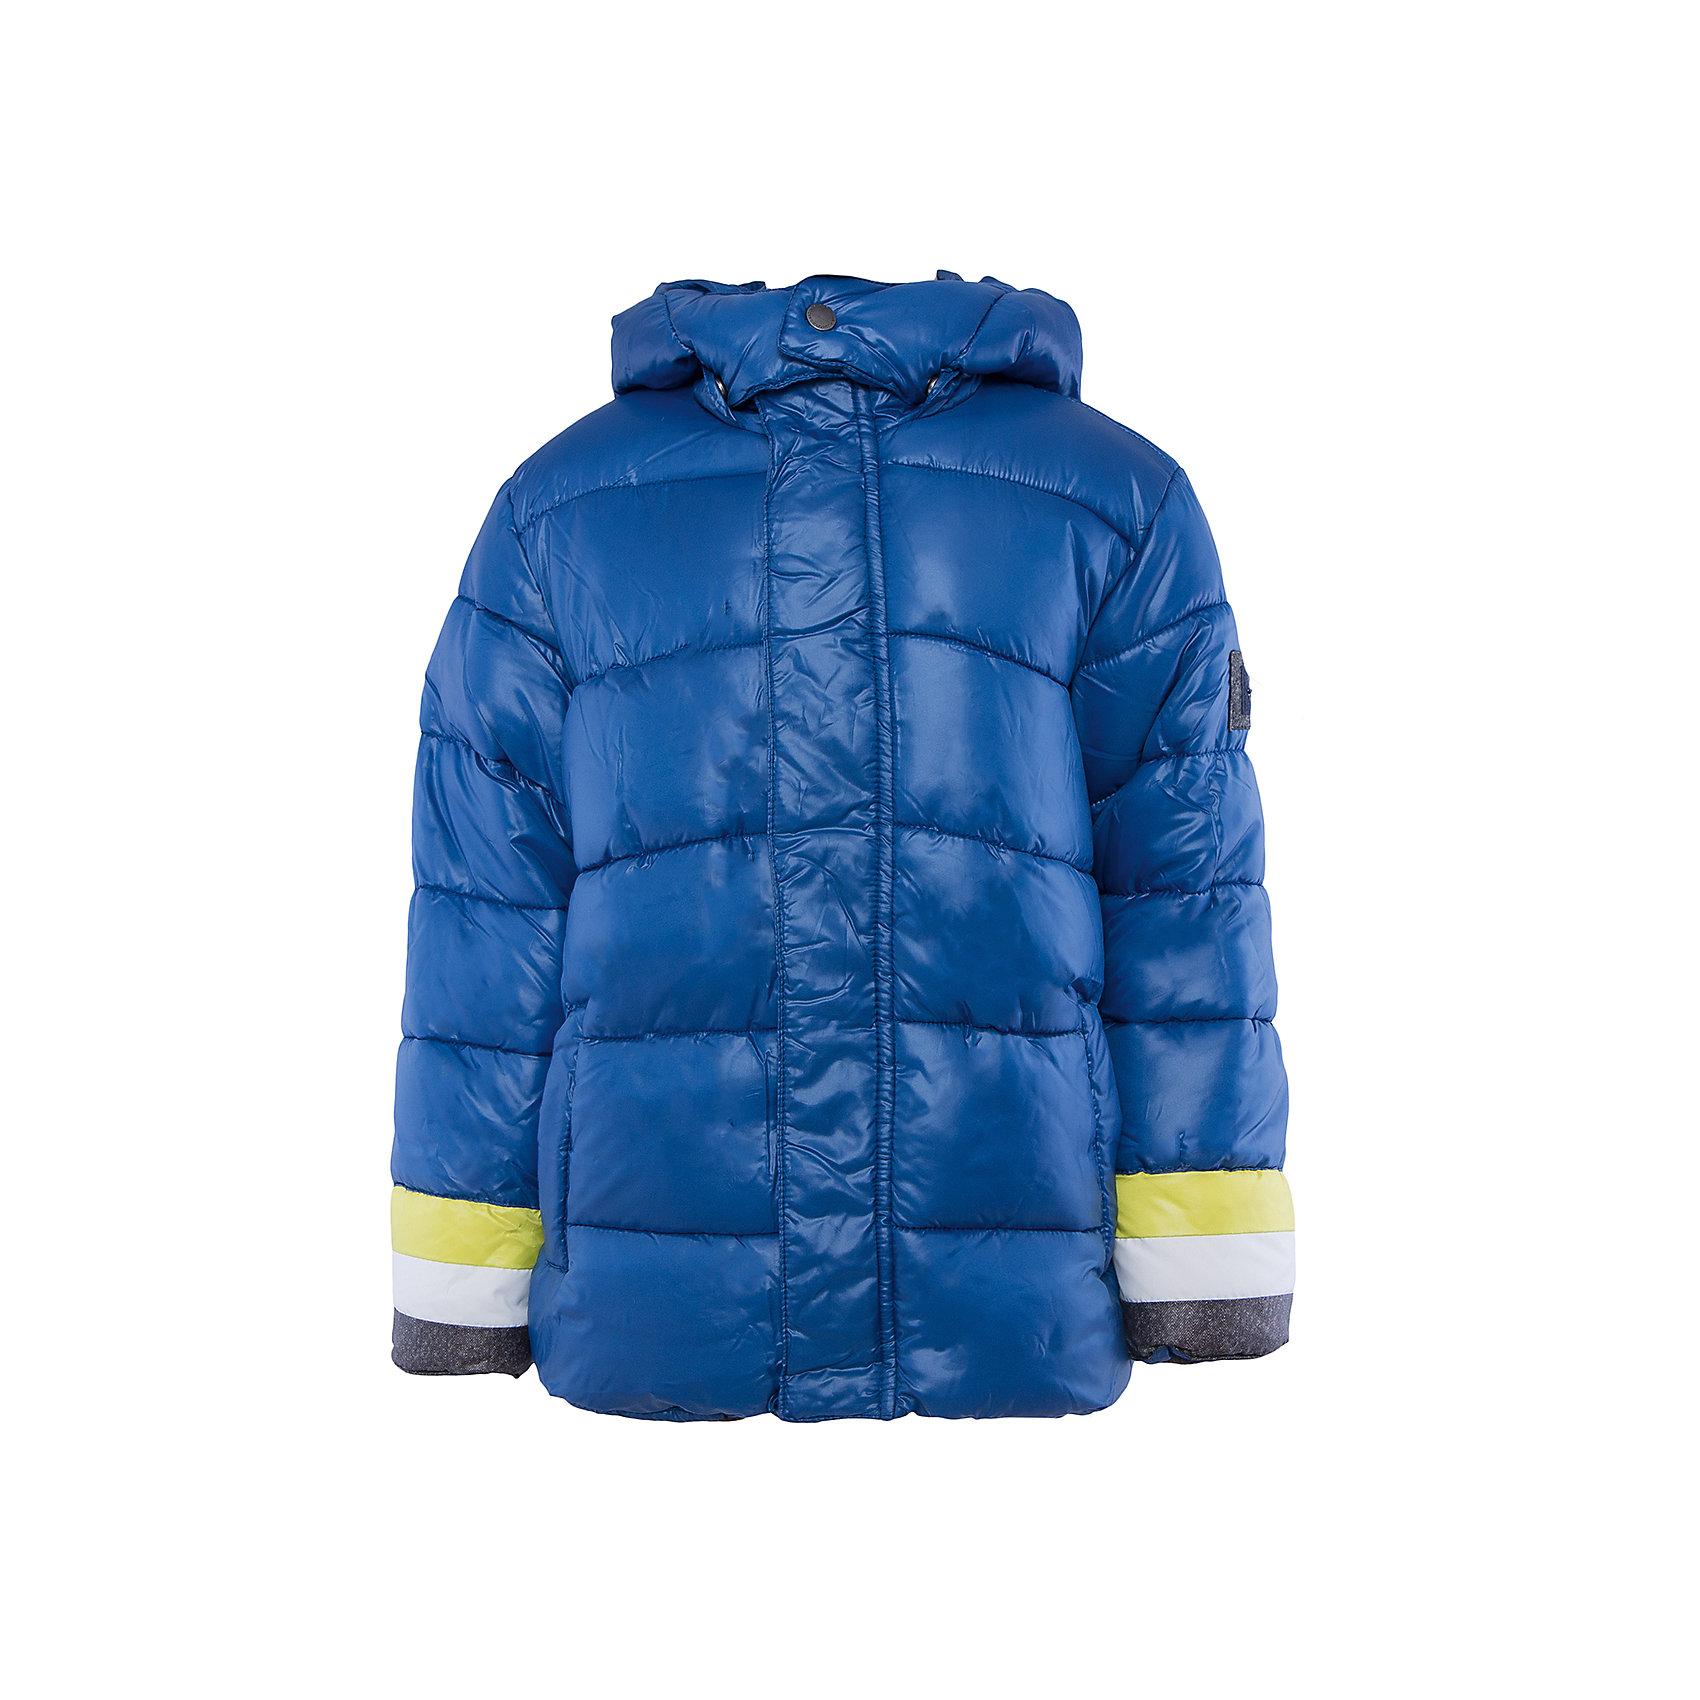 Куртка для мальчика MayoralВерхняя одежда<br>Куртка для мальчика известной испанской марки Mayoral.<br><br>Ширина мм: 356<br>Глубина мм: 10<br>Высота мм: 245<br>Вес г: 519<br>Цвет: синий<br>Возраст от месяцев: 156<br>Возраст до месяцев: 168<br>Пол: Мужской<br>Возраст: Детский<br>Размер: 146/152,152/158,164/170,158/164,128/134,140/146<br>SKU: 4827106